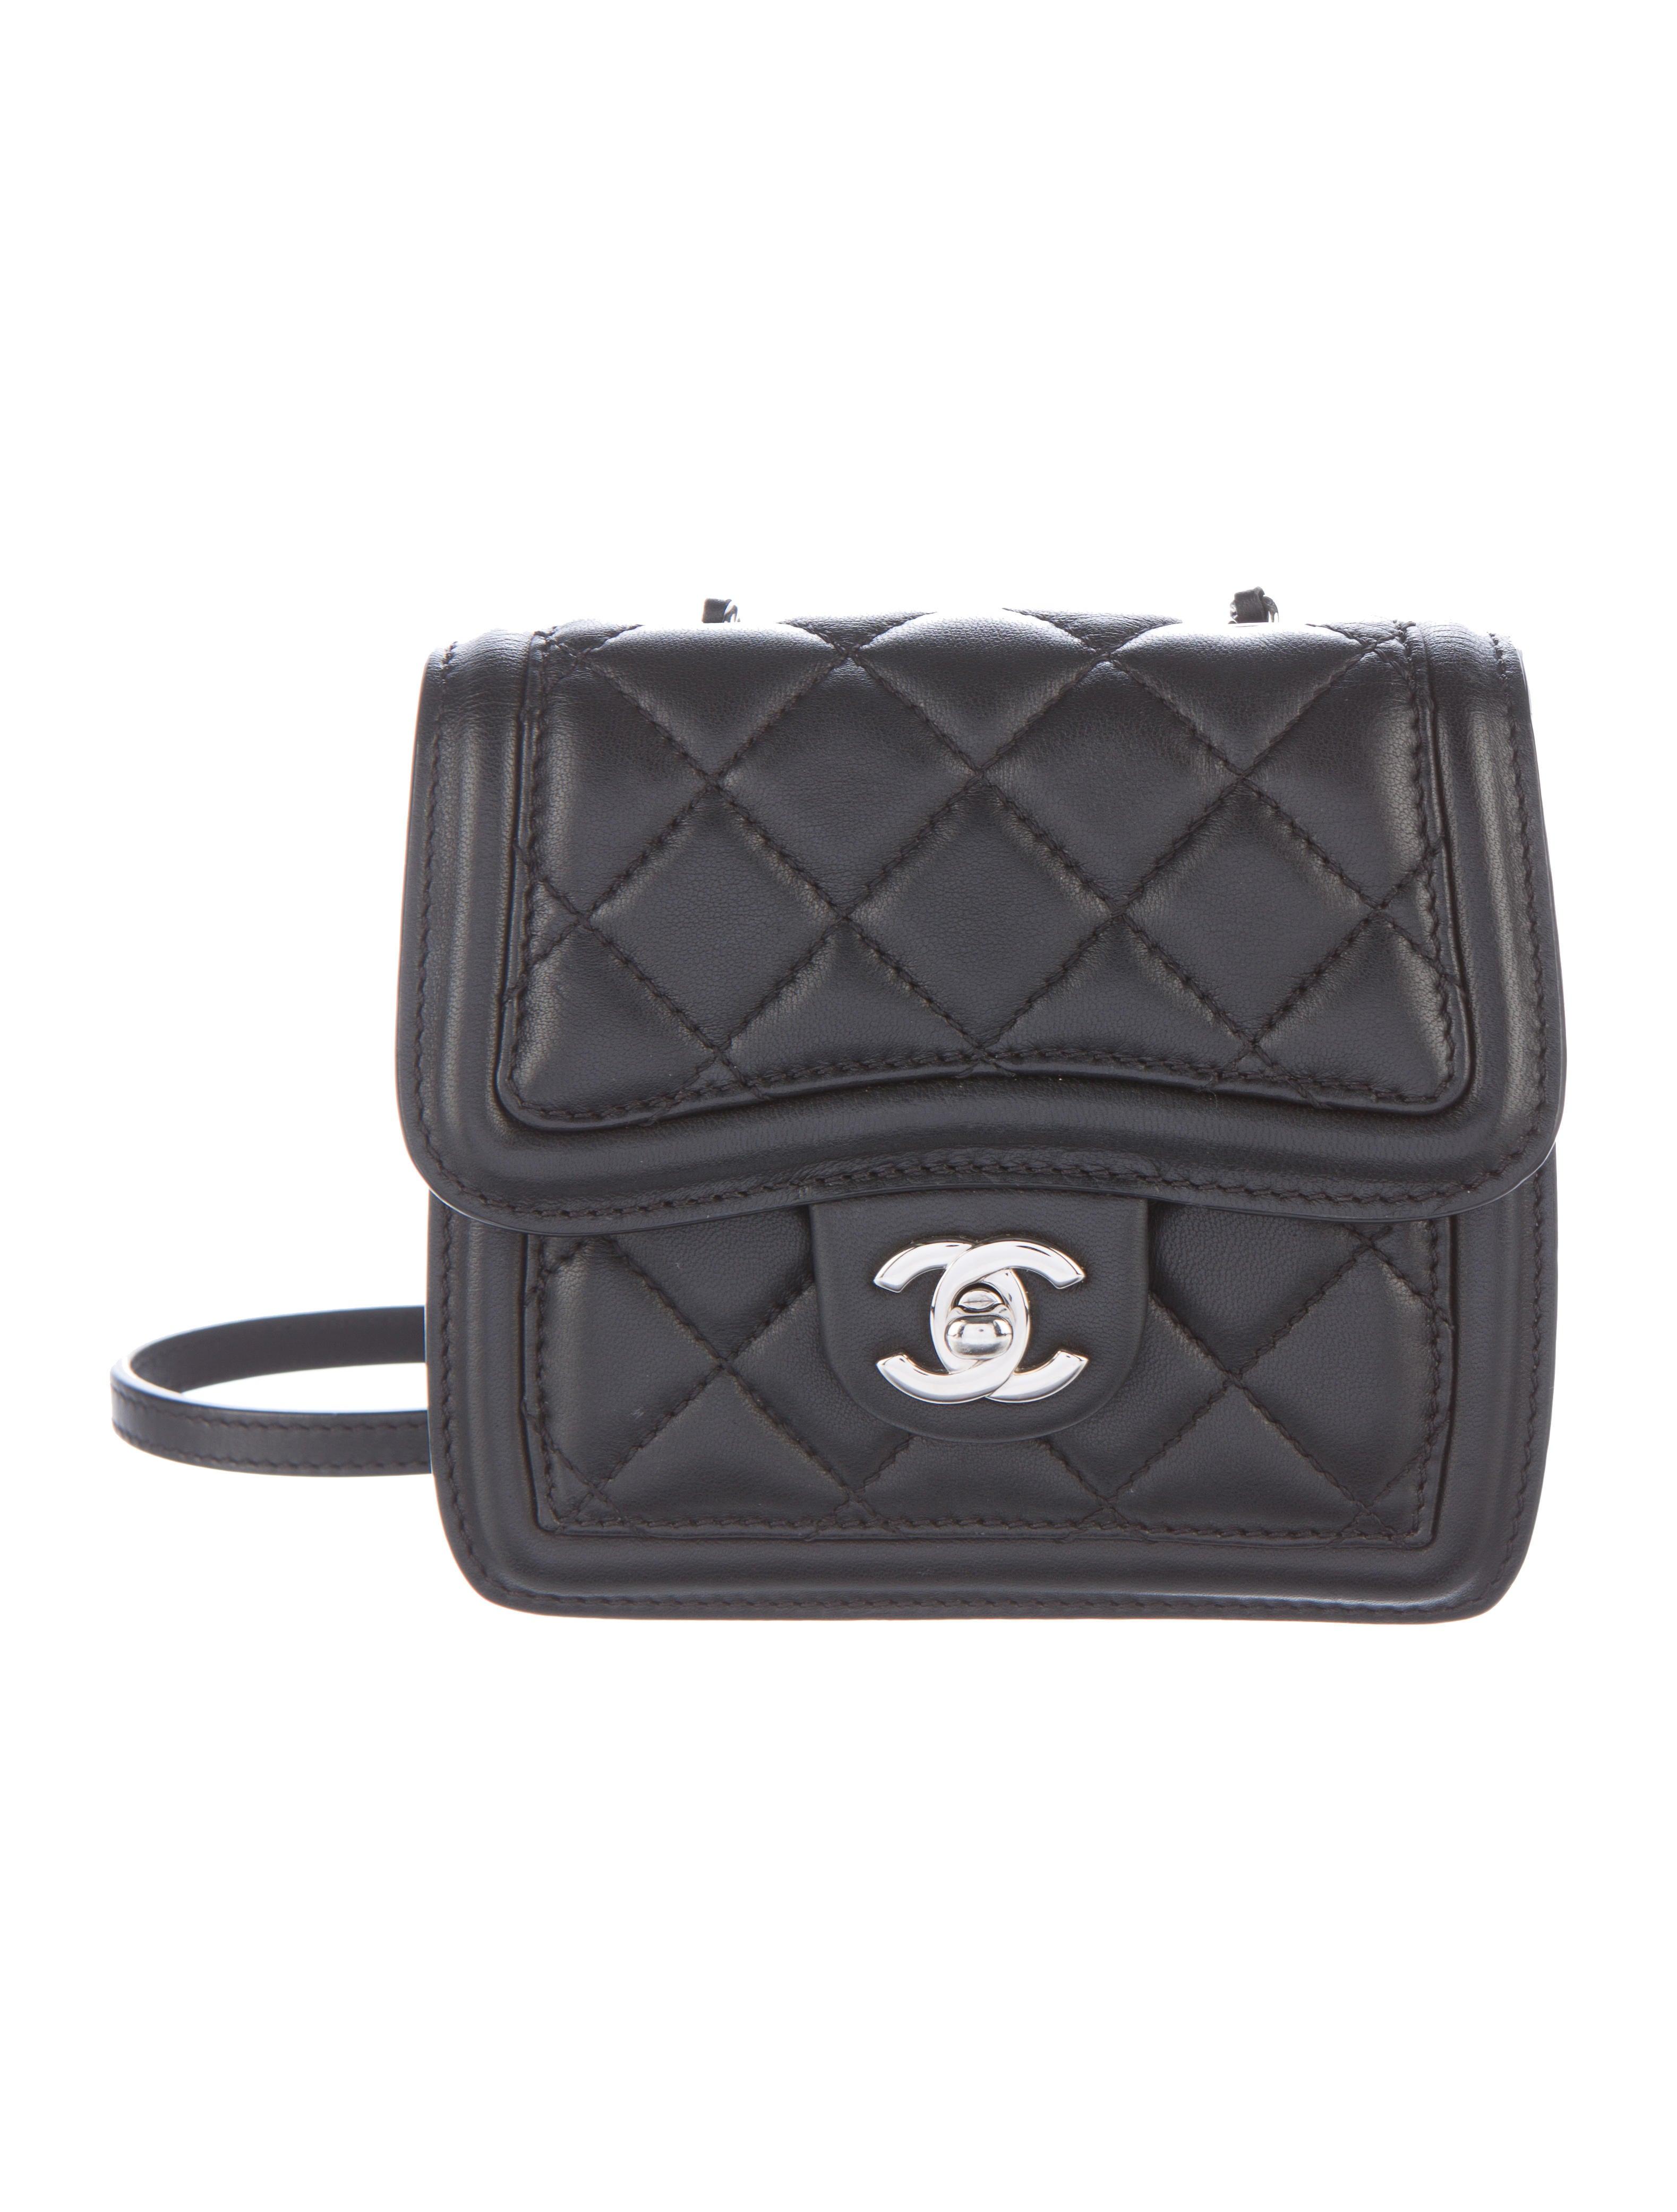 chanel 2013 graphic accordion mini flap bag handbags